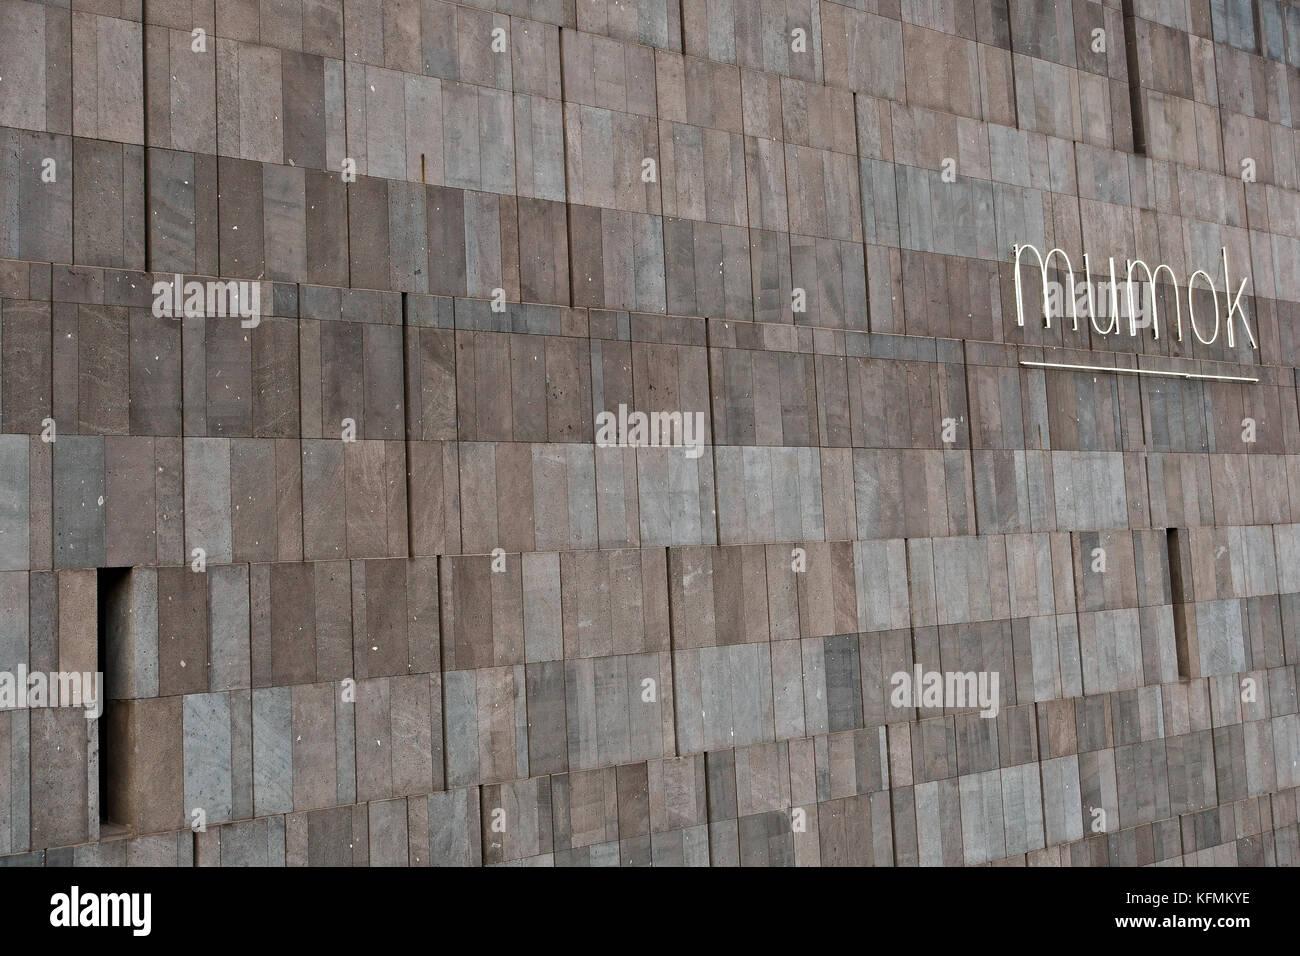 MUMOK, MUseum MOderner Kunst, (Museum of Modern Art). MuseumsQuartier Vienna, Wien, Austria, Europe. Architectural - Stock Image